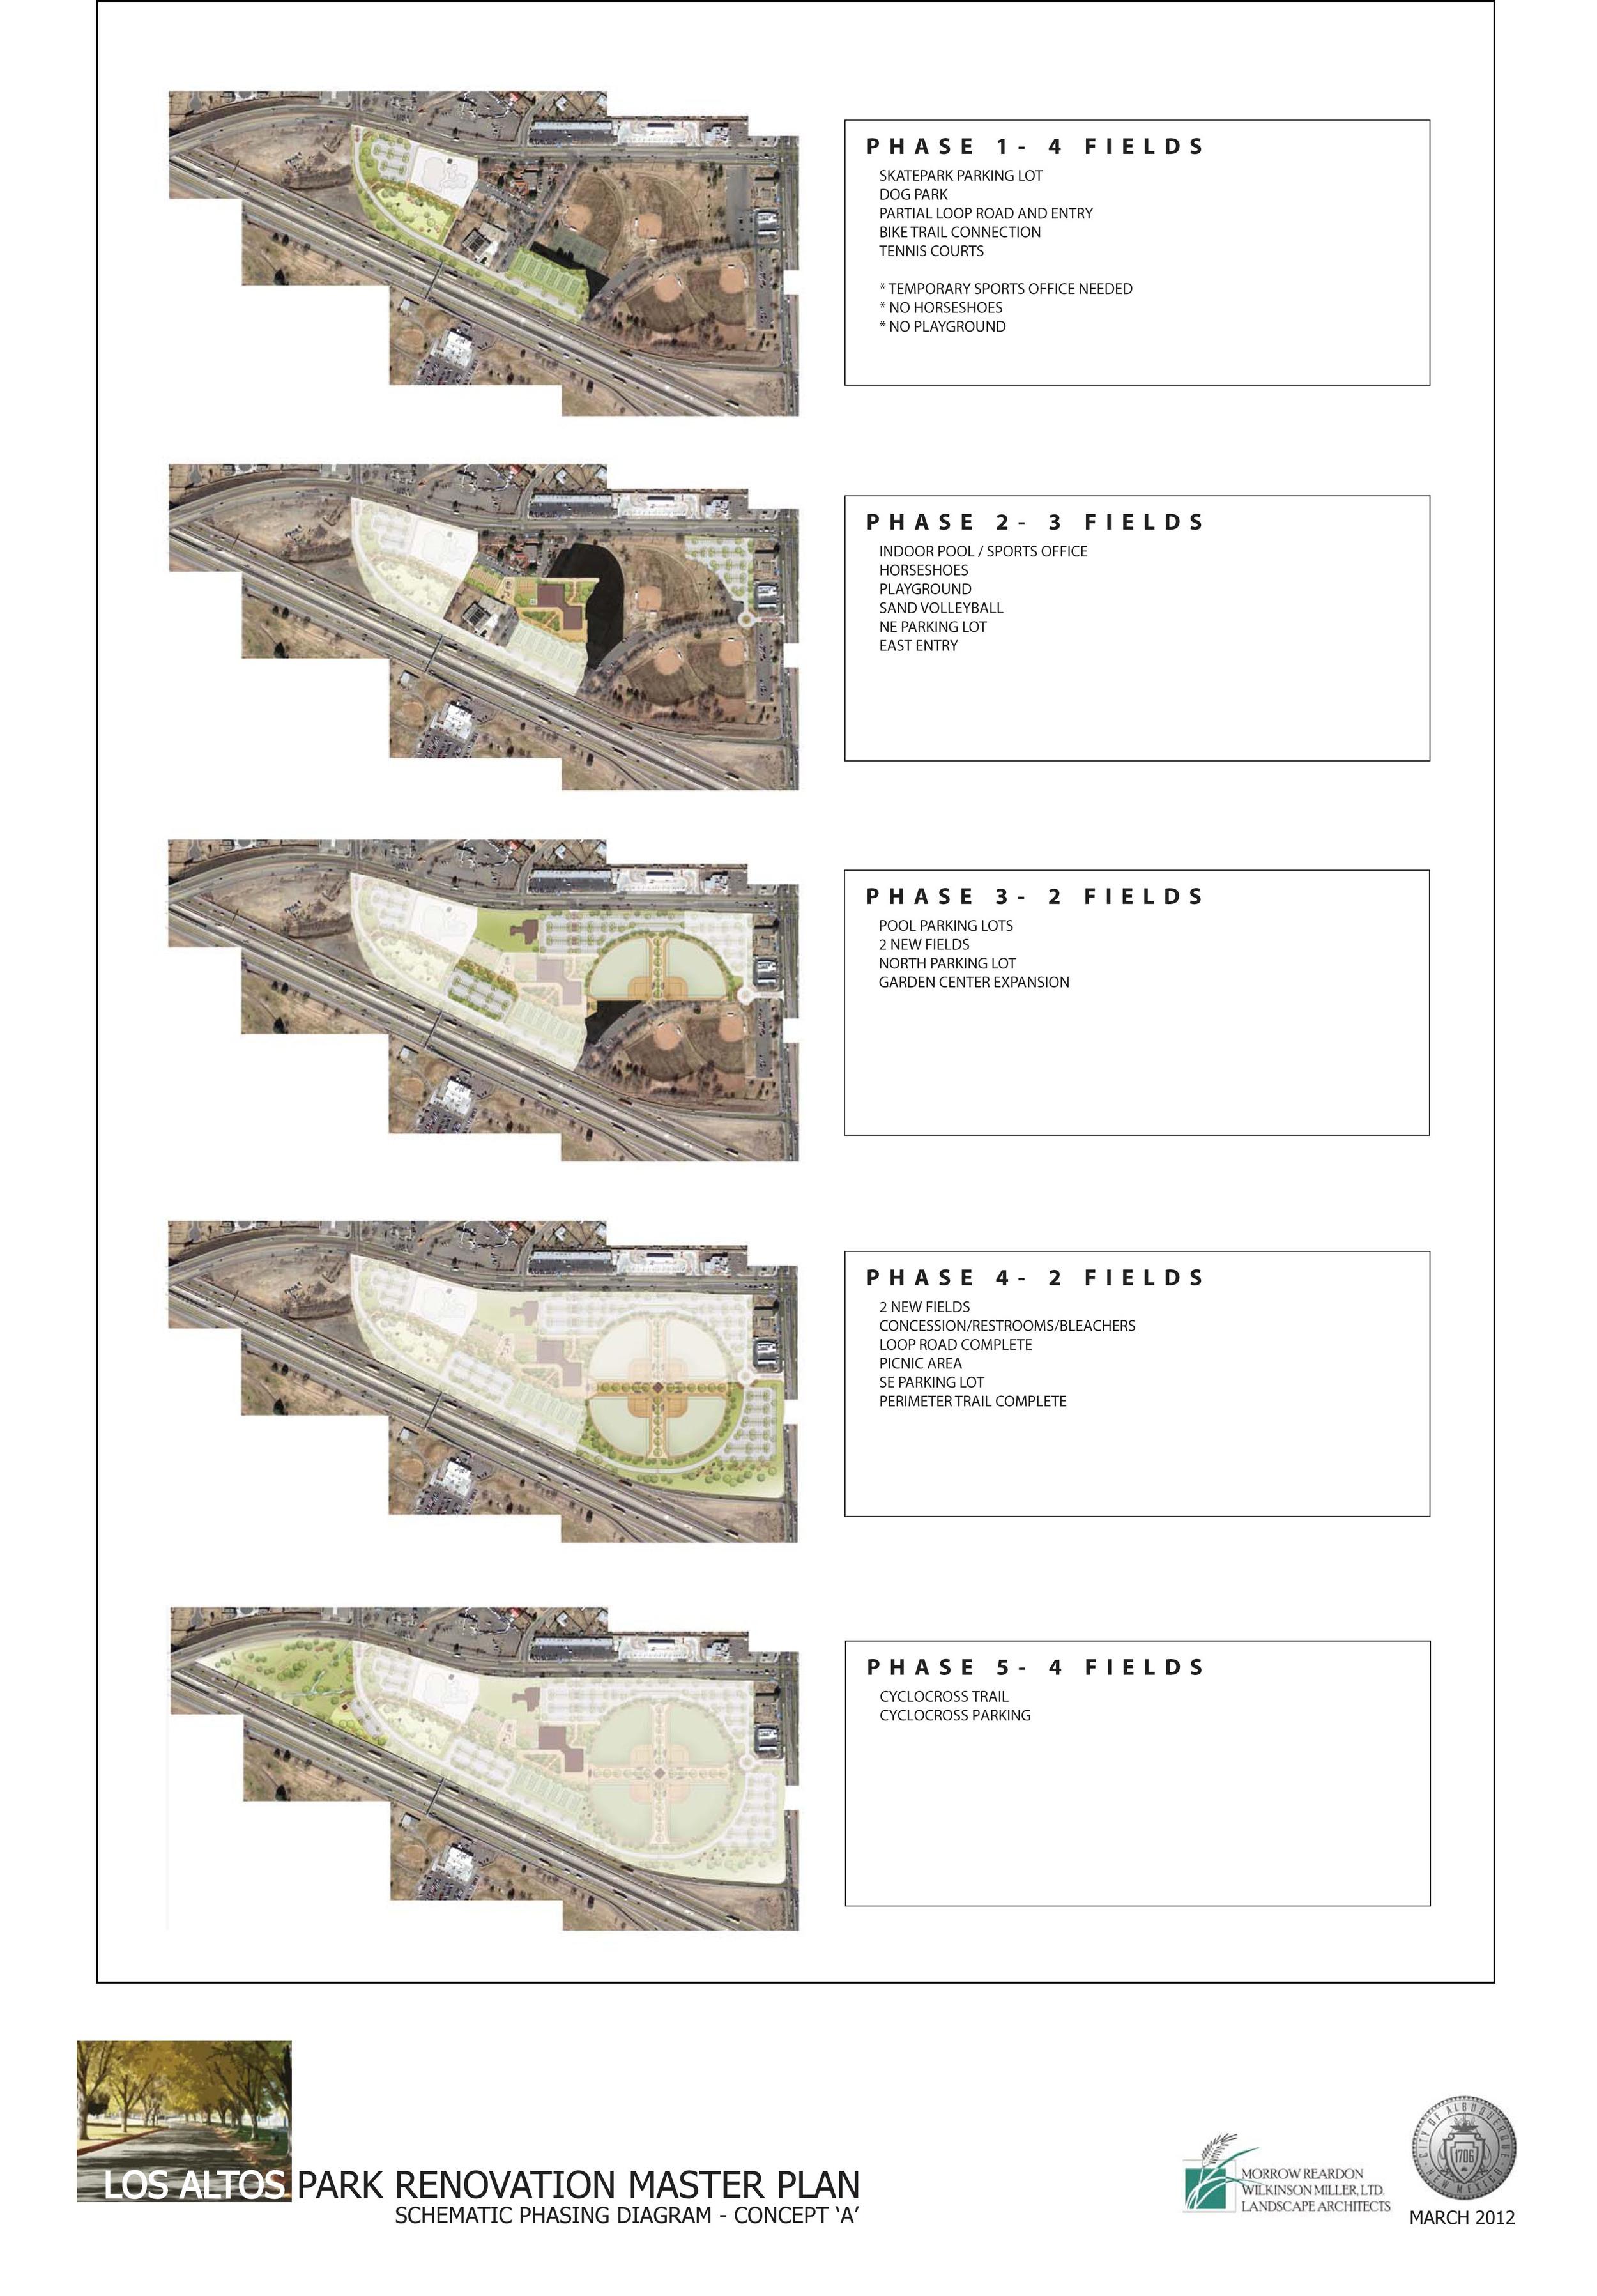 Final Phasing Diagram Concept A.jpg